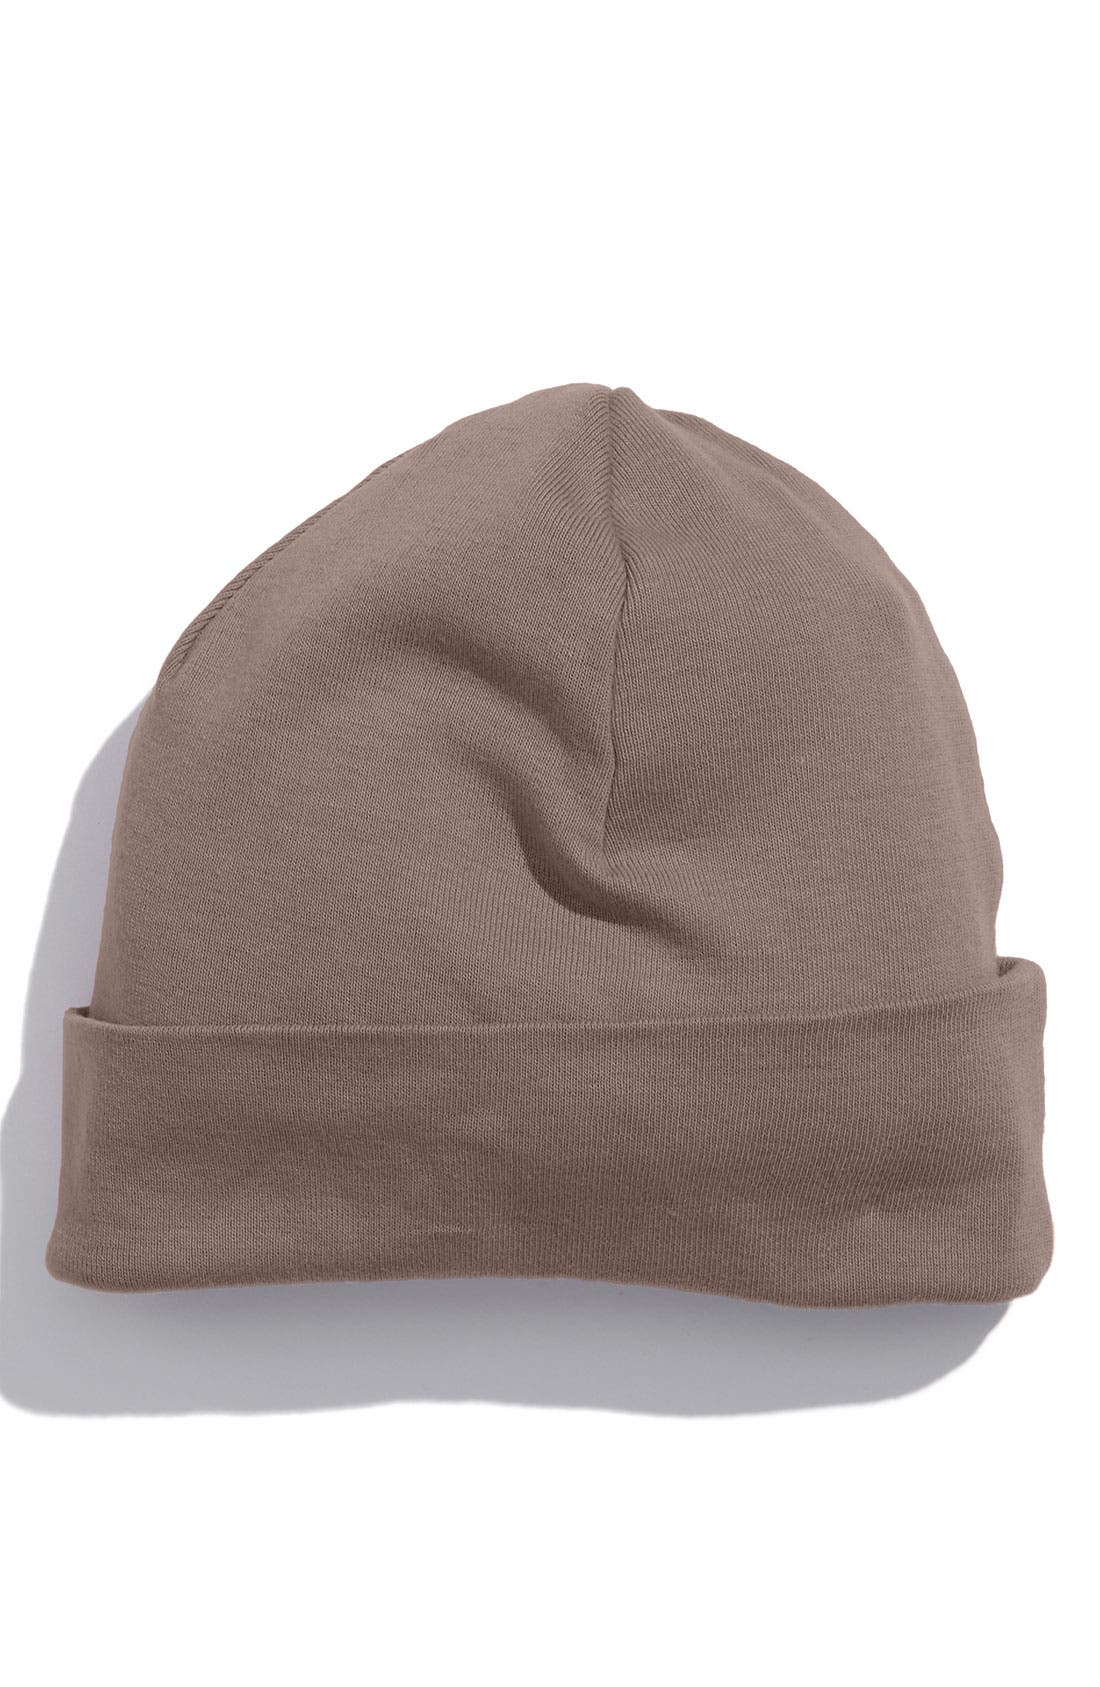 Main Image - Peek 'Little Peanut' Hat (Infant)